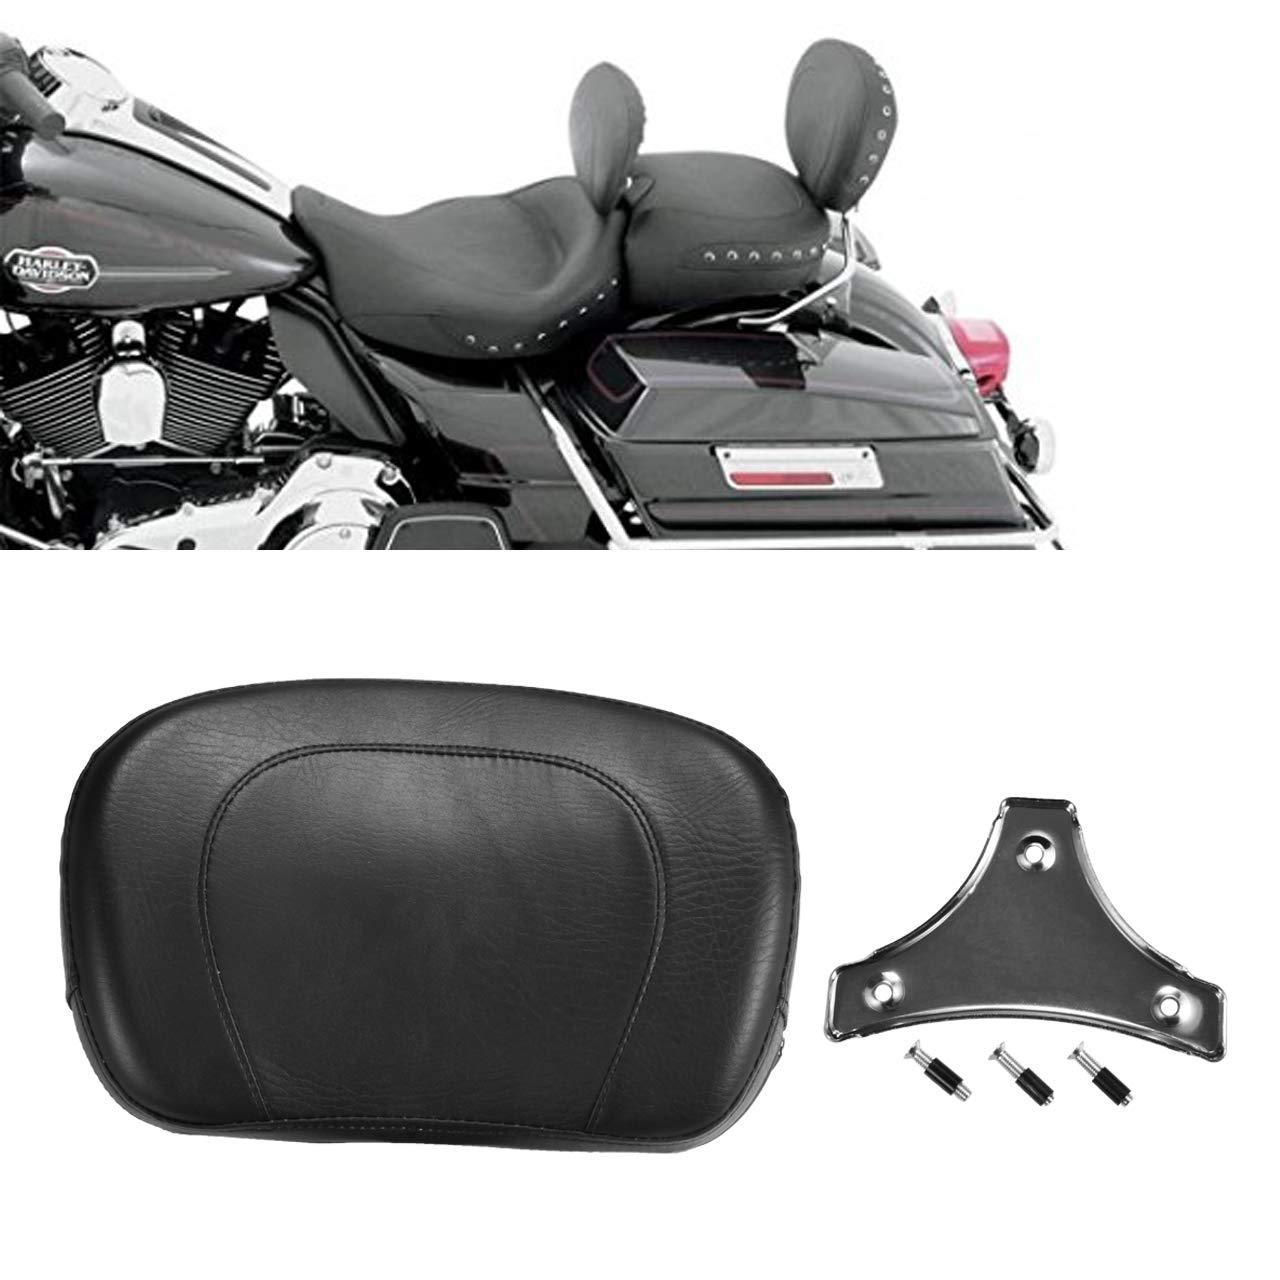 TUINCYN Motorcycle Detachable Backrest Pad Bracket Rear Passenger Black Leather Seat Fits For Harley Yamaha Honda Suzuki Kawasaki Bikes//Custom Bikes//Choppers//Touring//Cruiser